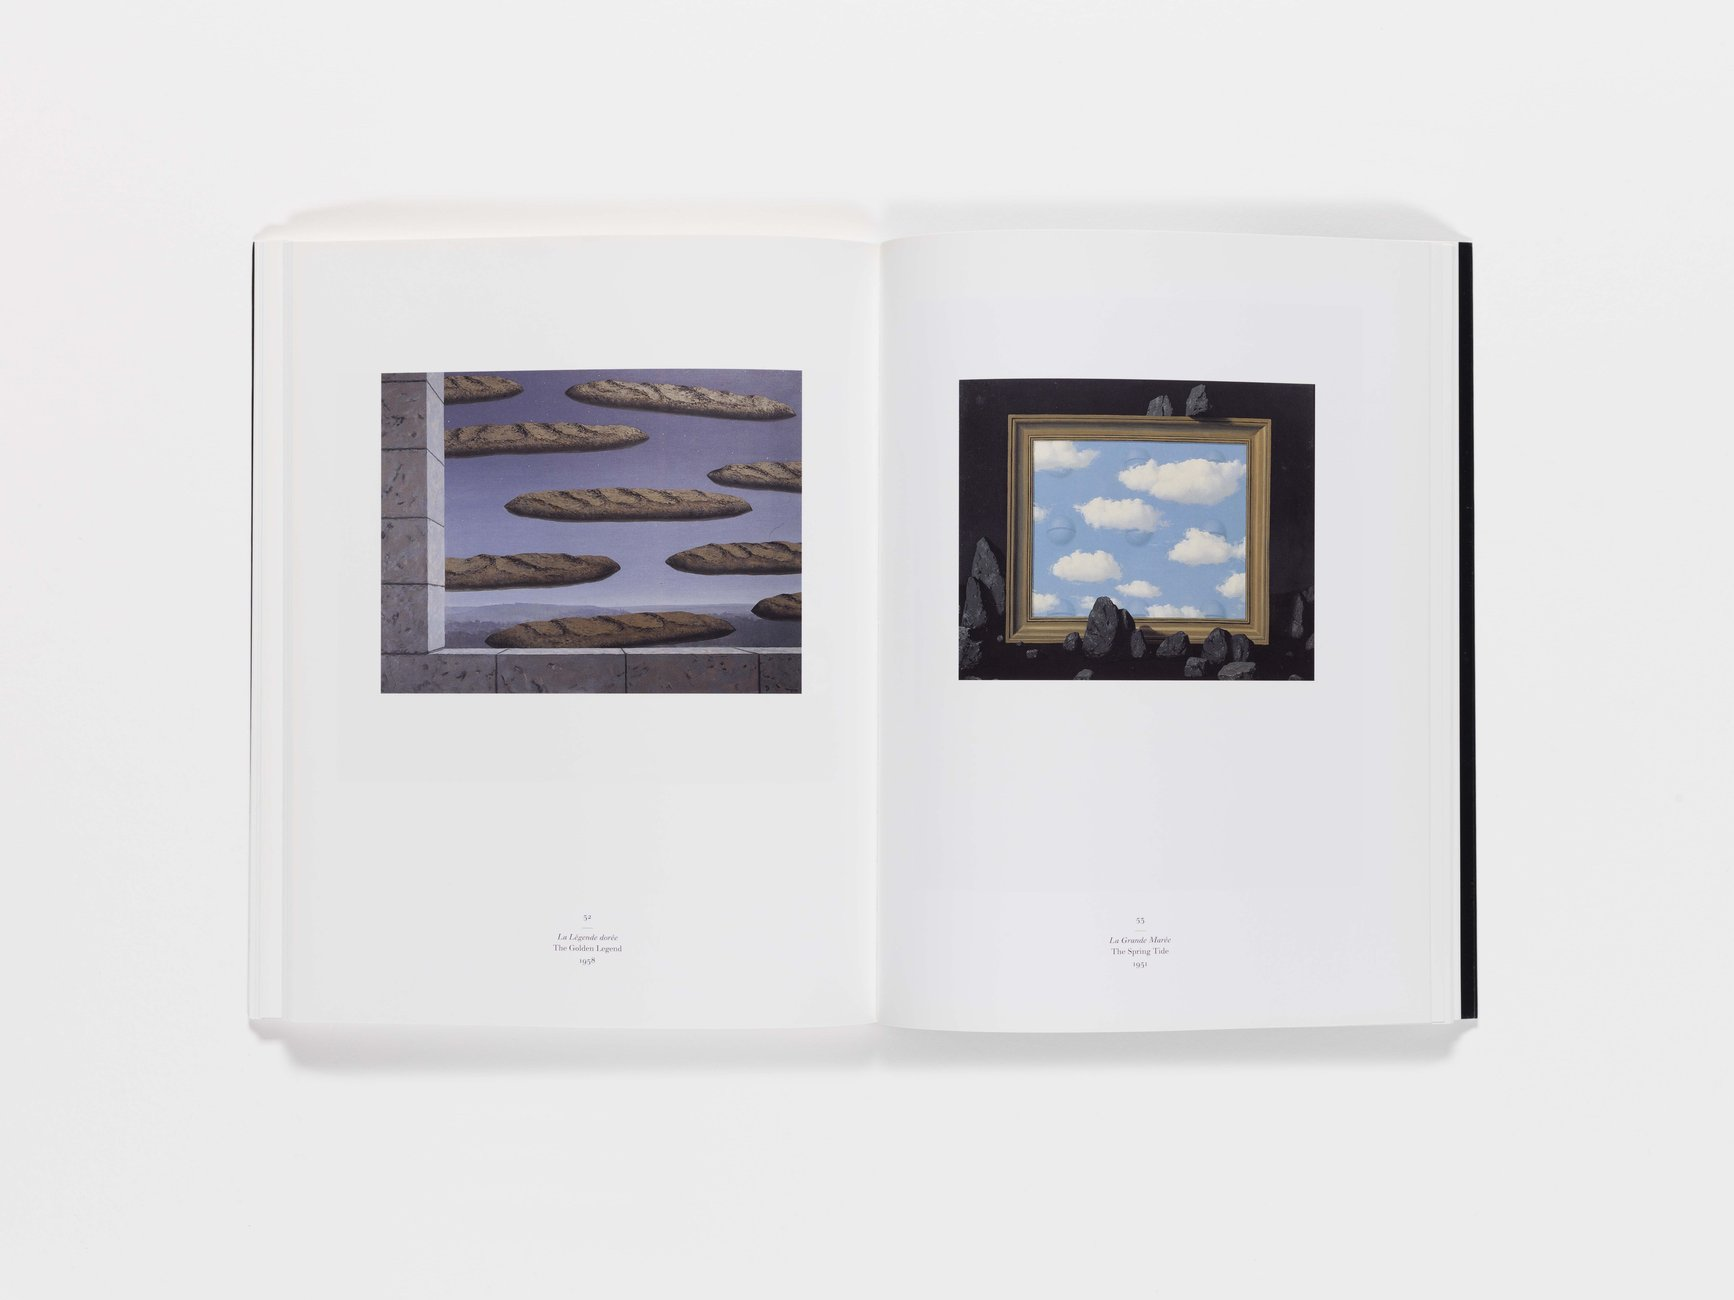 Magritte publication pages 84-85